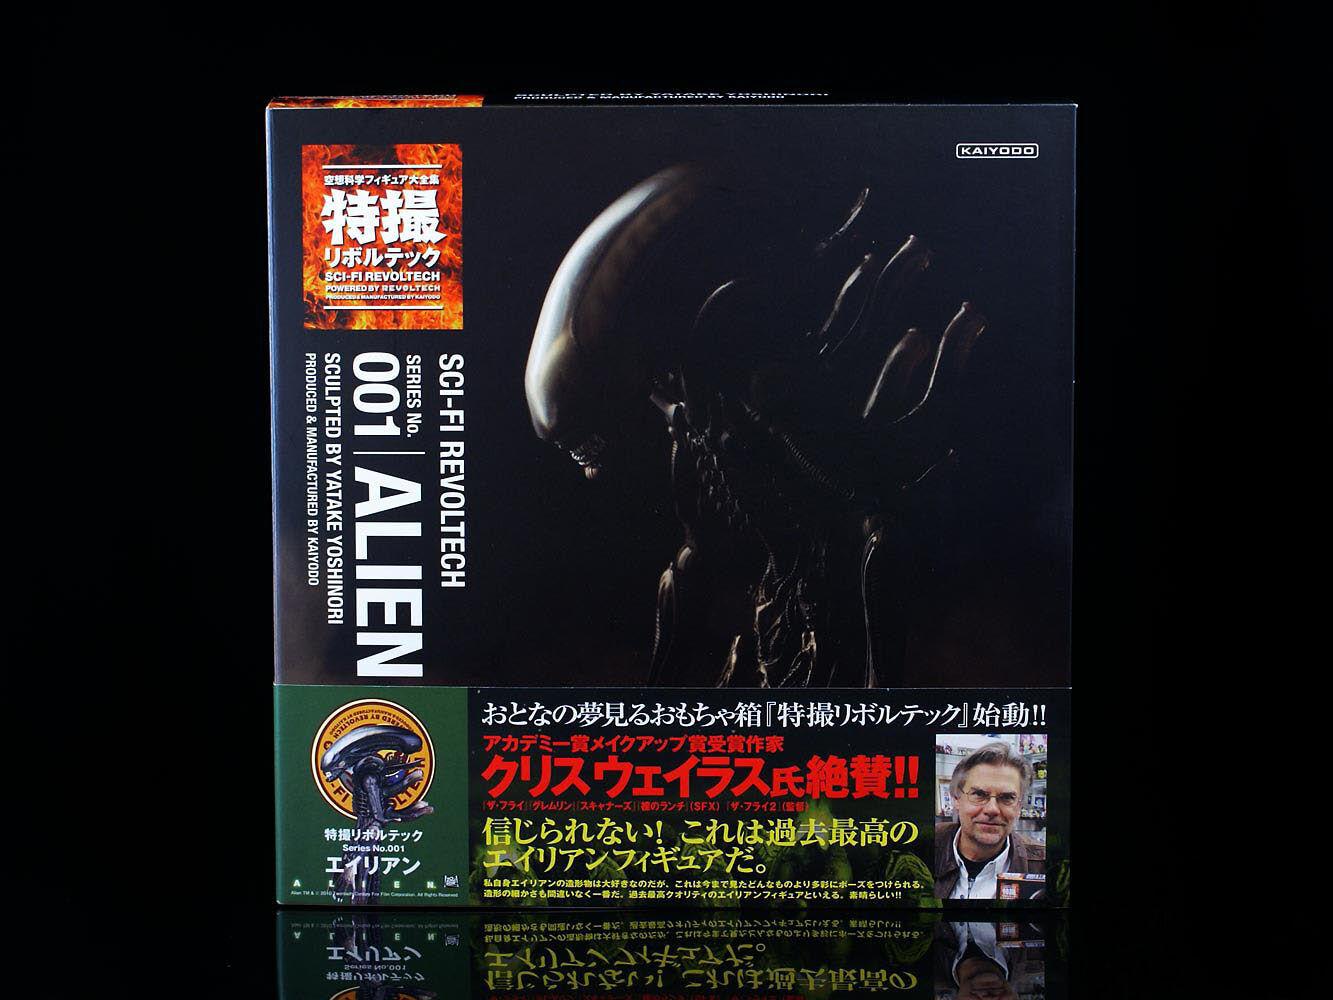 NEW AUTHENTIC AUTHENTIC AUTHENTIC ALIEN BIG CHAP SCI-FI REVOLTECH 001 KAIYODO JAPAN FIGURE BOOK BOX 42cc63